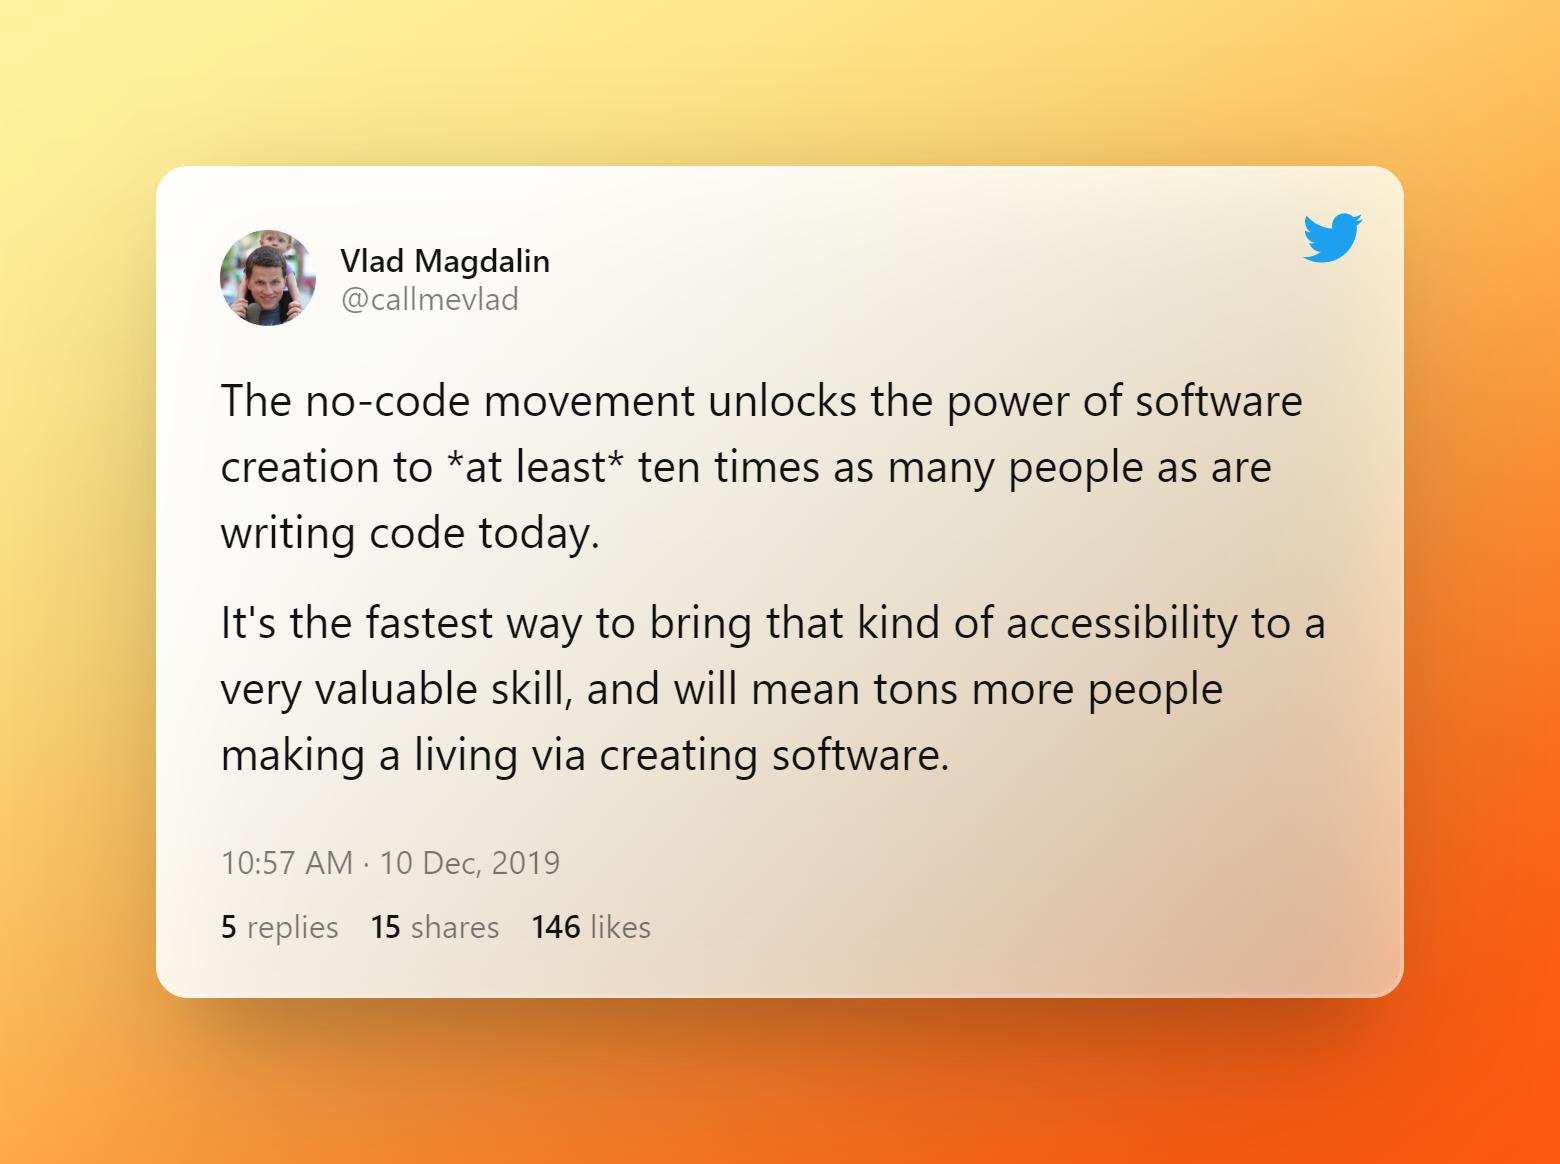 Tweet by Vlad Magdalin